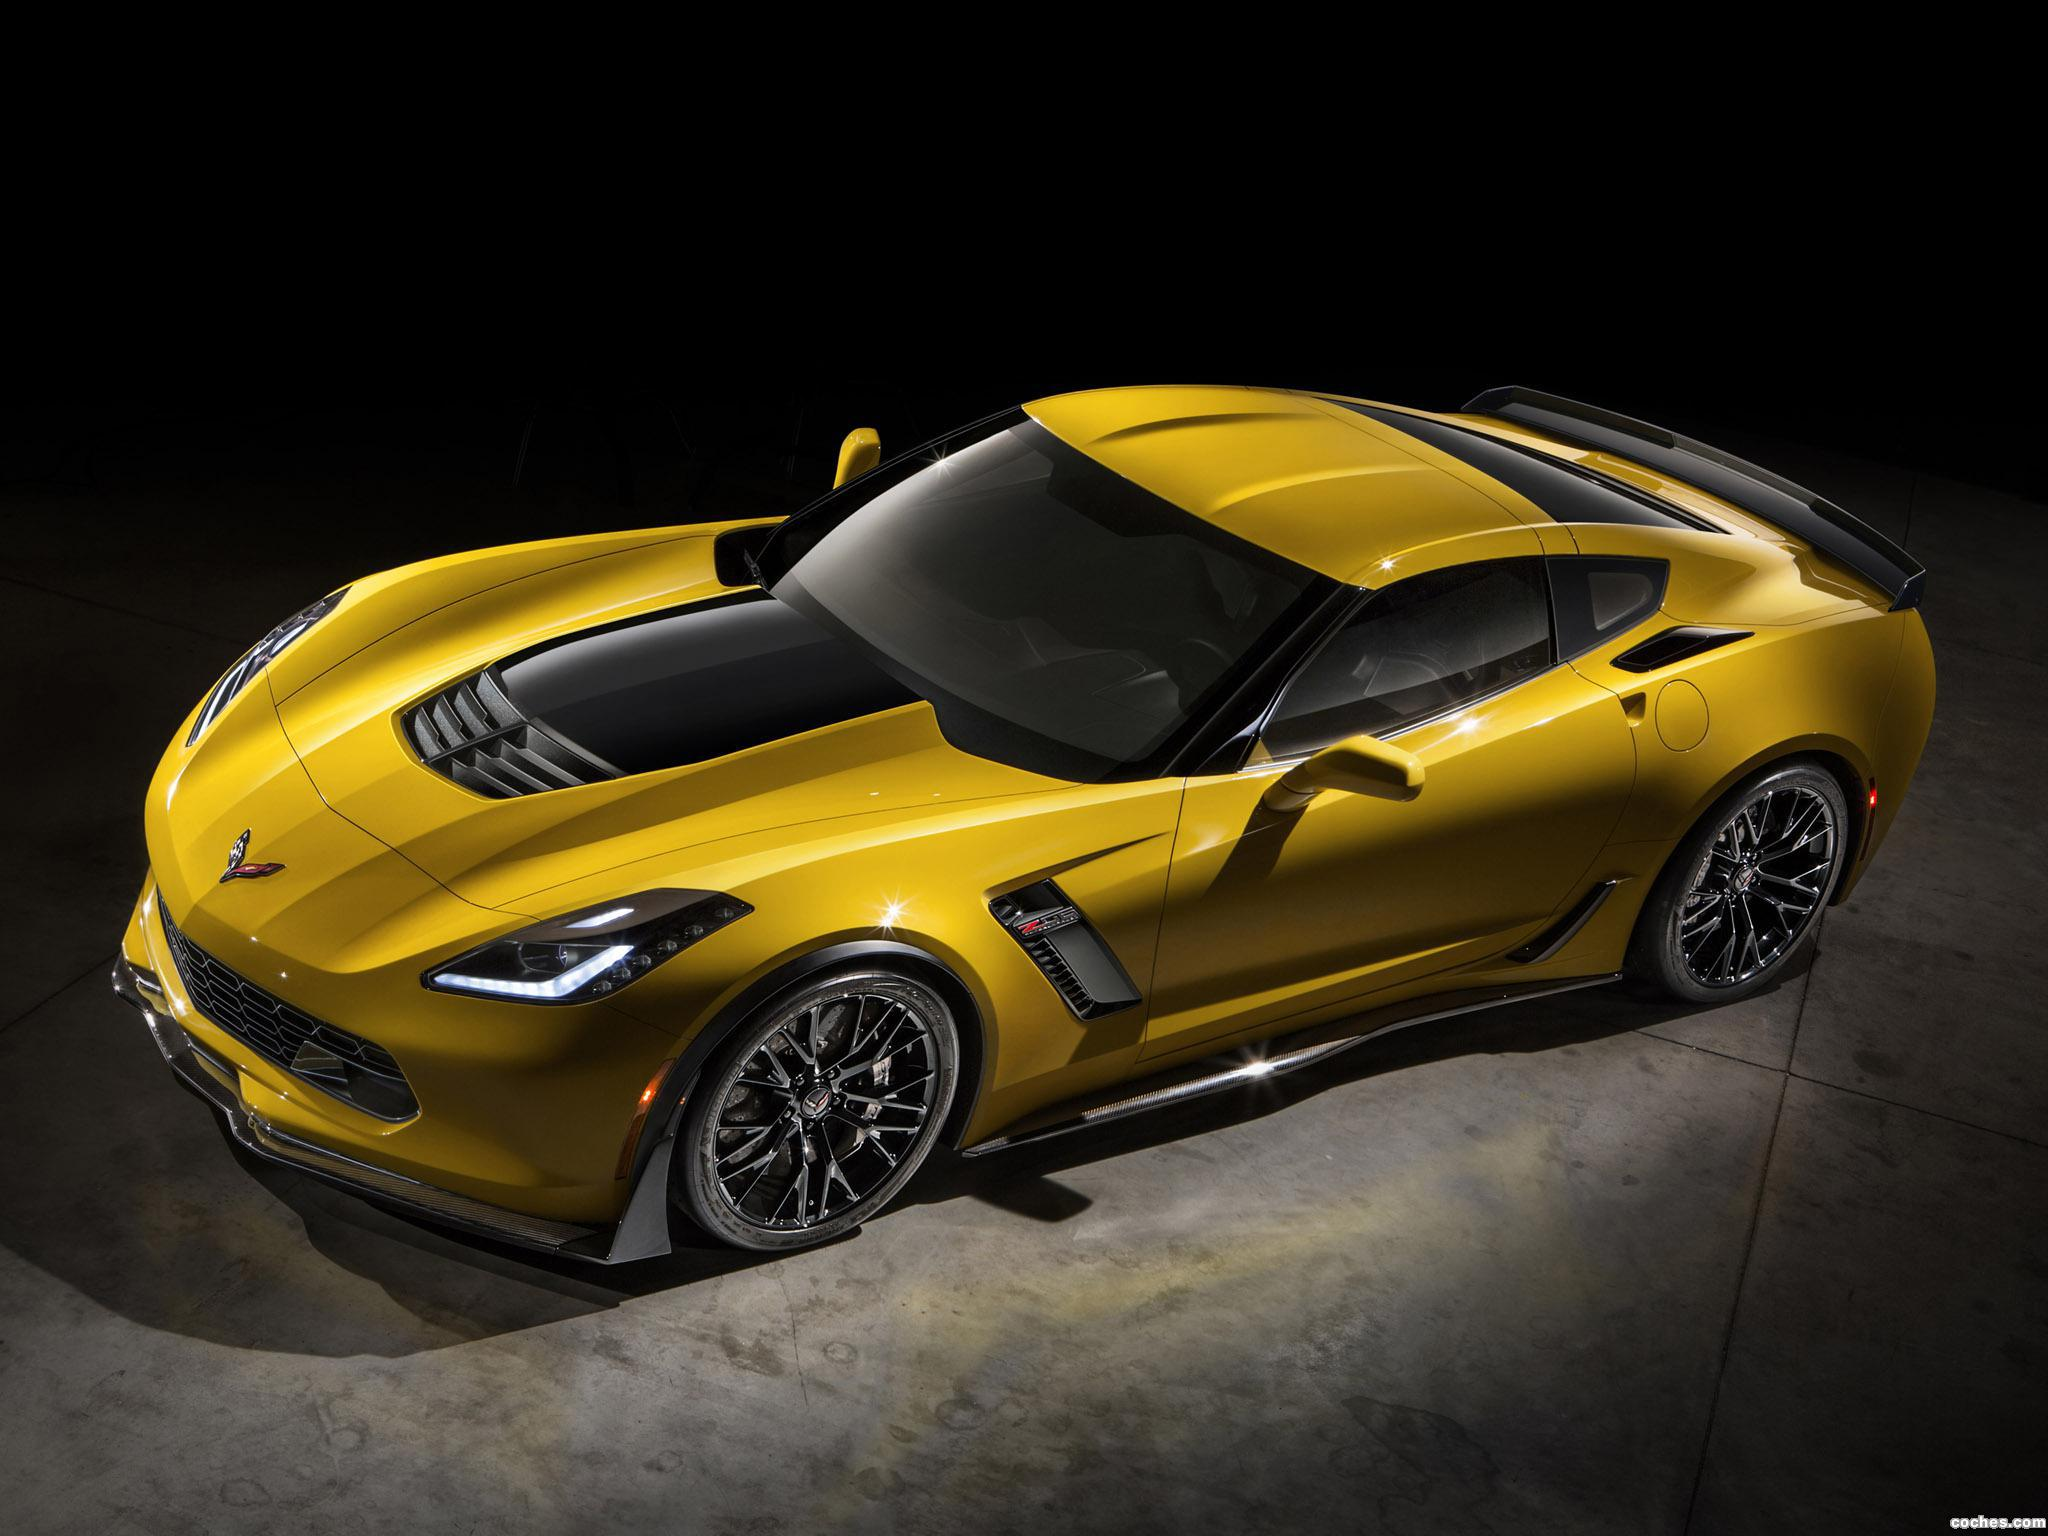 corvette stingray z06 c7 2014 r11 chevrolet corvette stingray z06 c7. Cars Review. Best American Auto & Cars Review